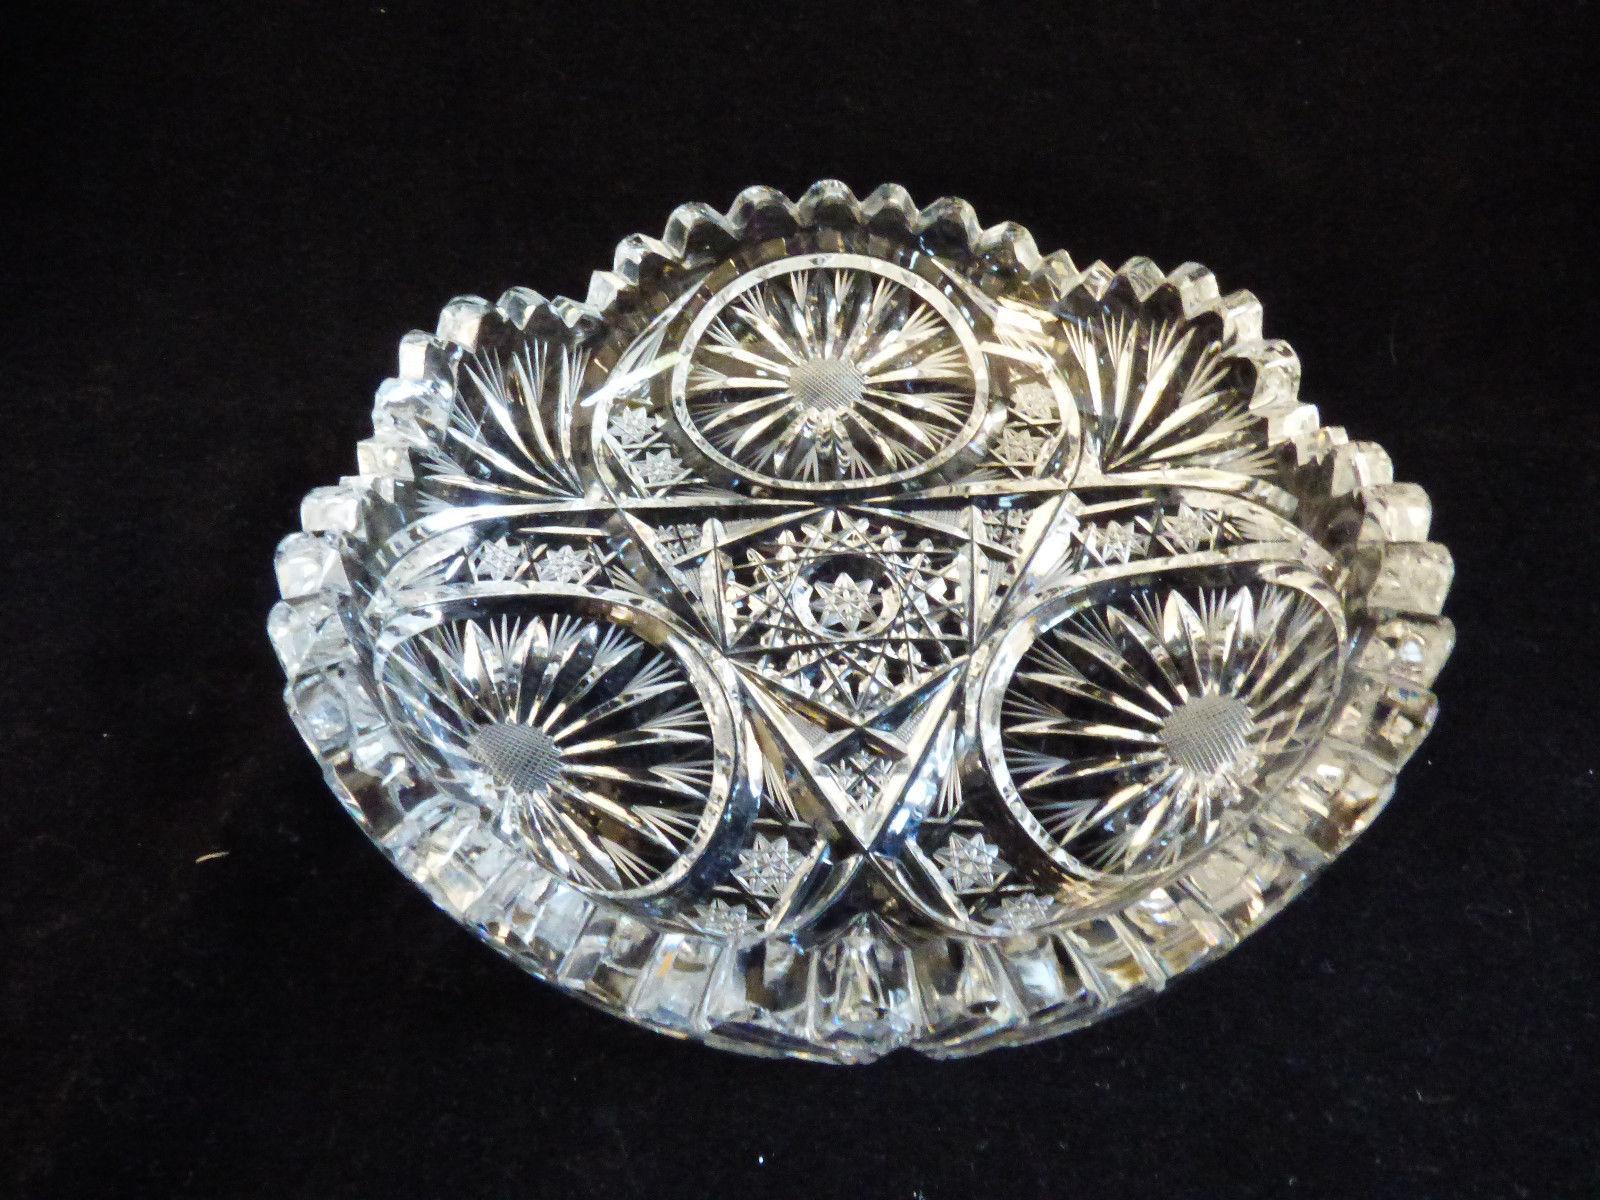 Antique VTG American Brilliant Period deep Cut Crystal round Bowl dish - $41.18